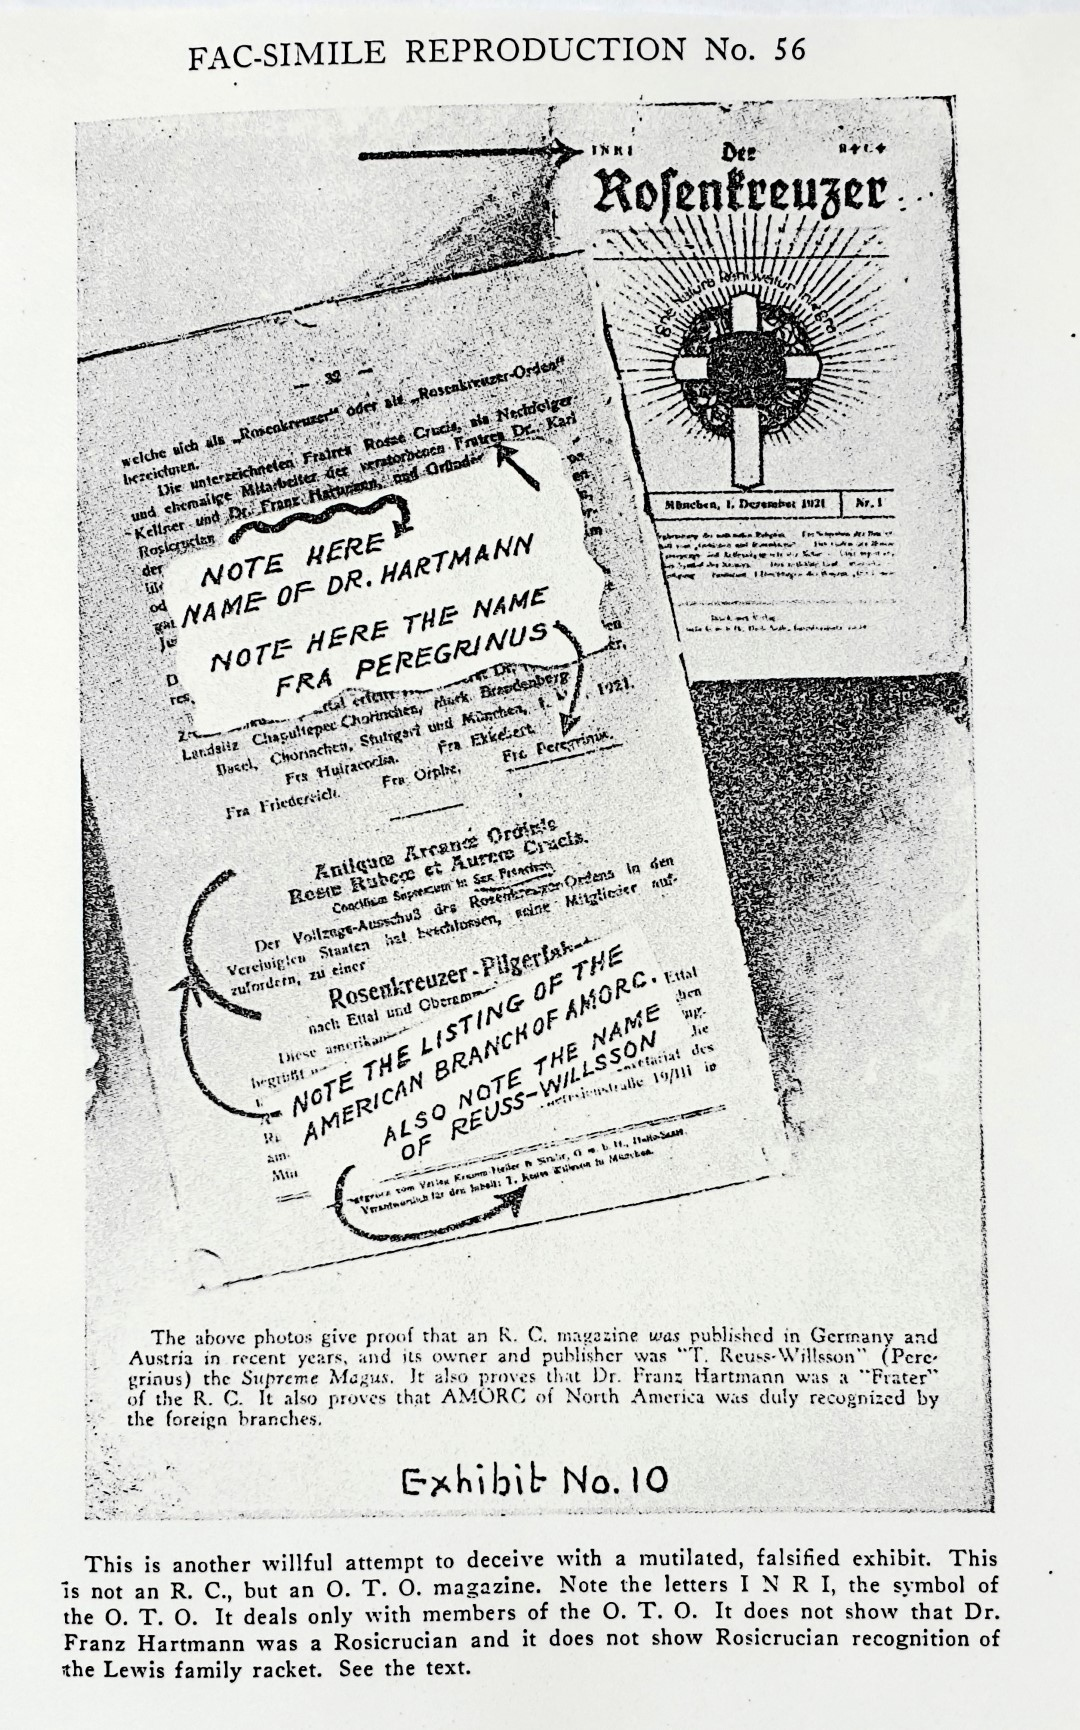 Reuben Swinburne Clymer, The Rosicrucian Fraternity in America, Book of Rosicruciae, Spencer Lewis, A.M.O.R.C., Der Rosenkreuzer, Arnoldo Krumm-Heller, Franz Hartmann